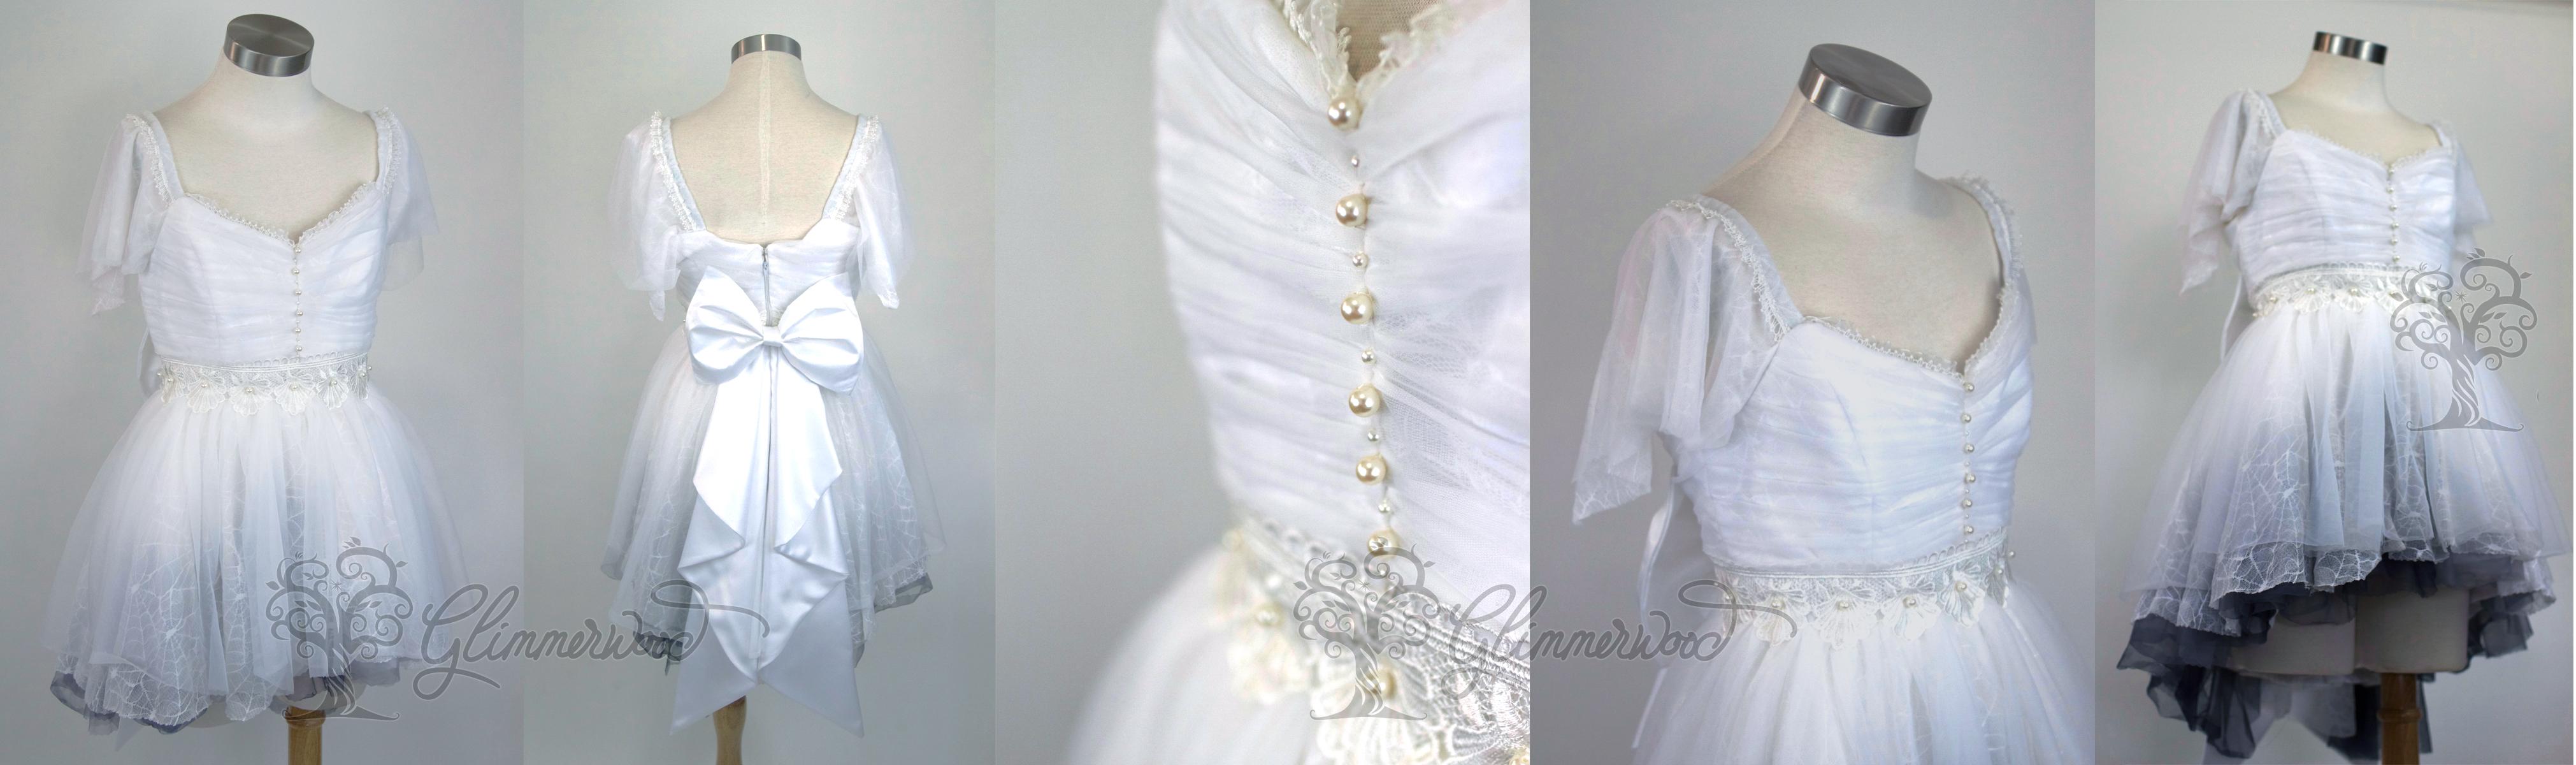 Bebe's Wedding Dress